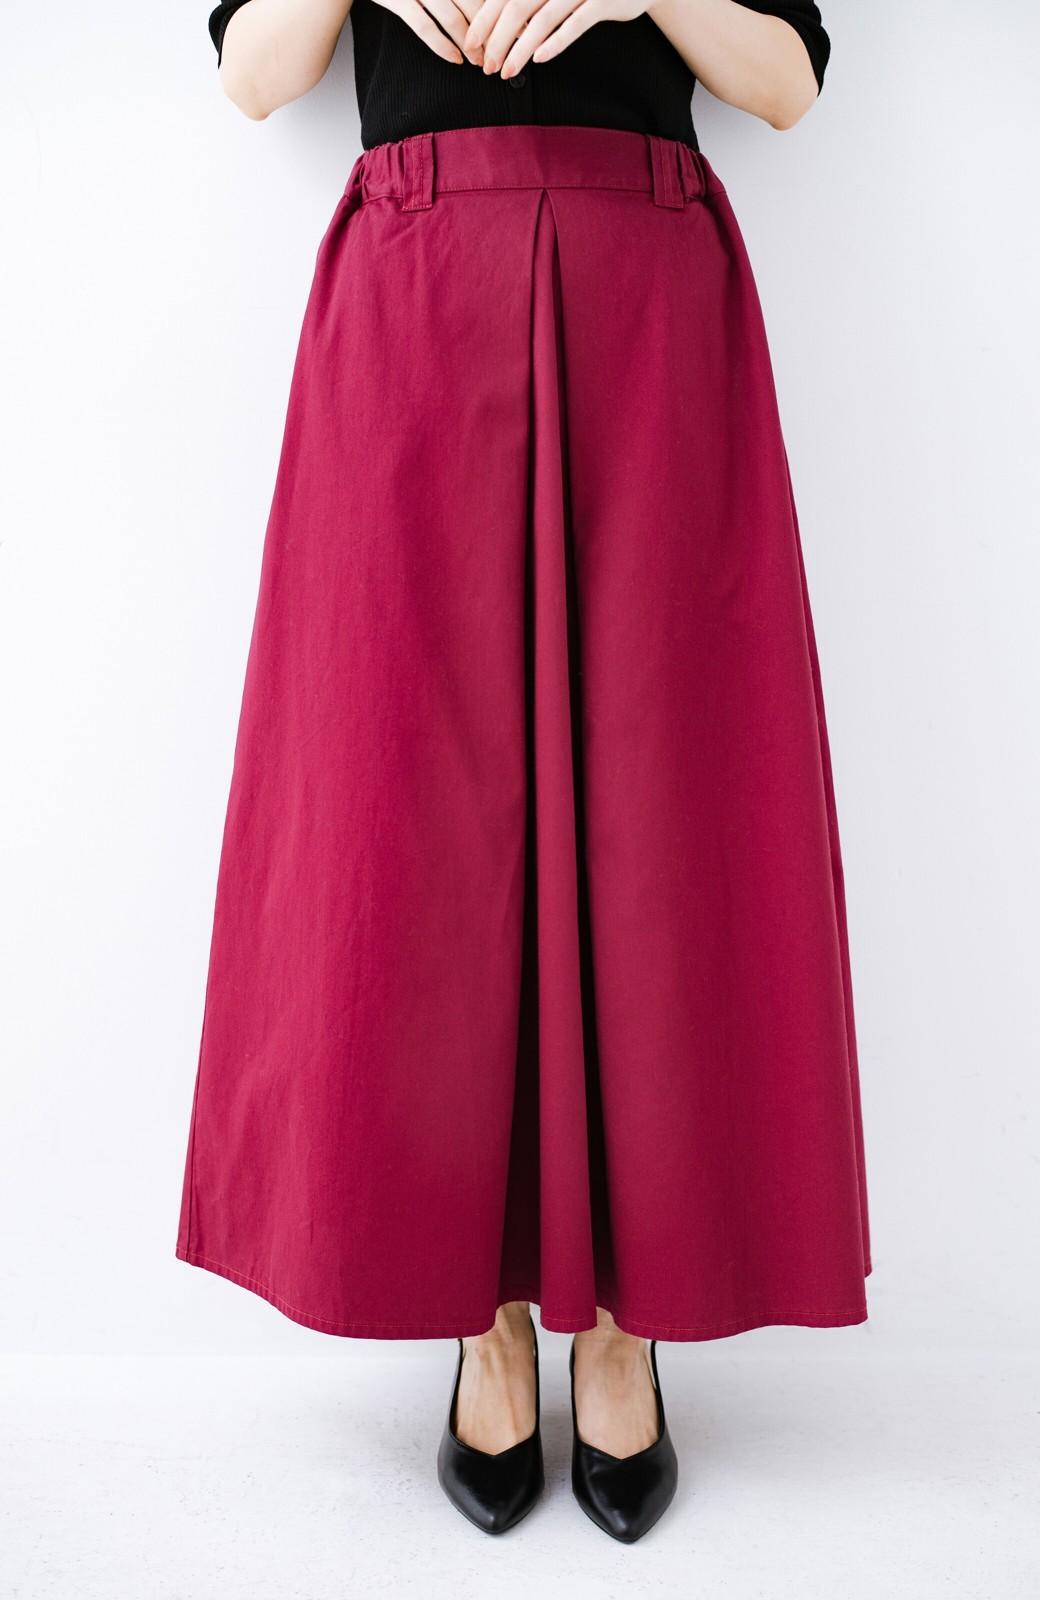 haco! ロングシーズン楽しめる タックボリュームのチノロングスカート <パープル>の商品写真3